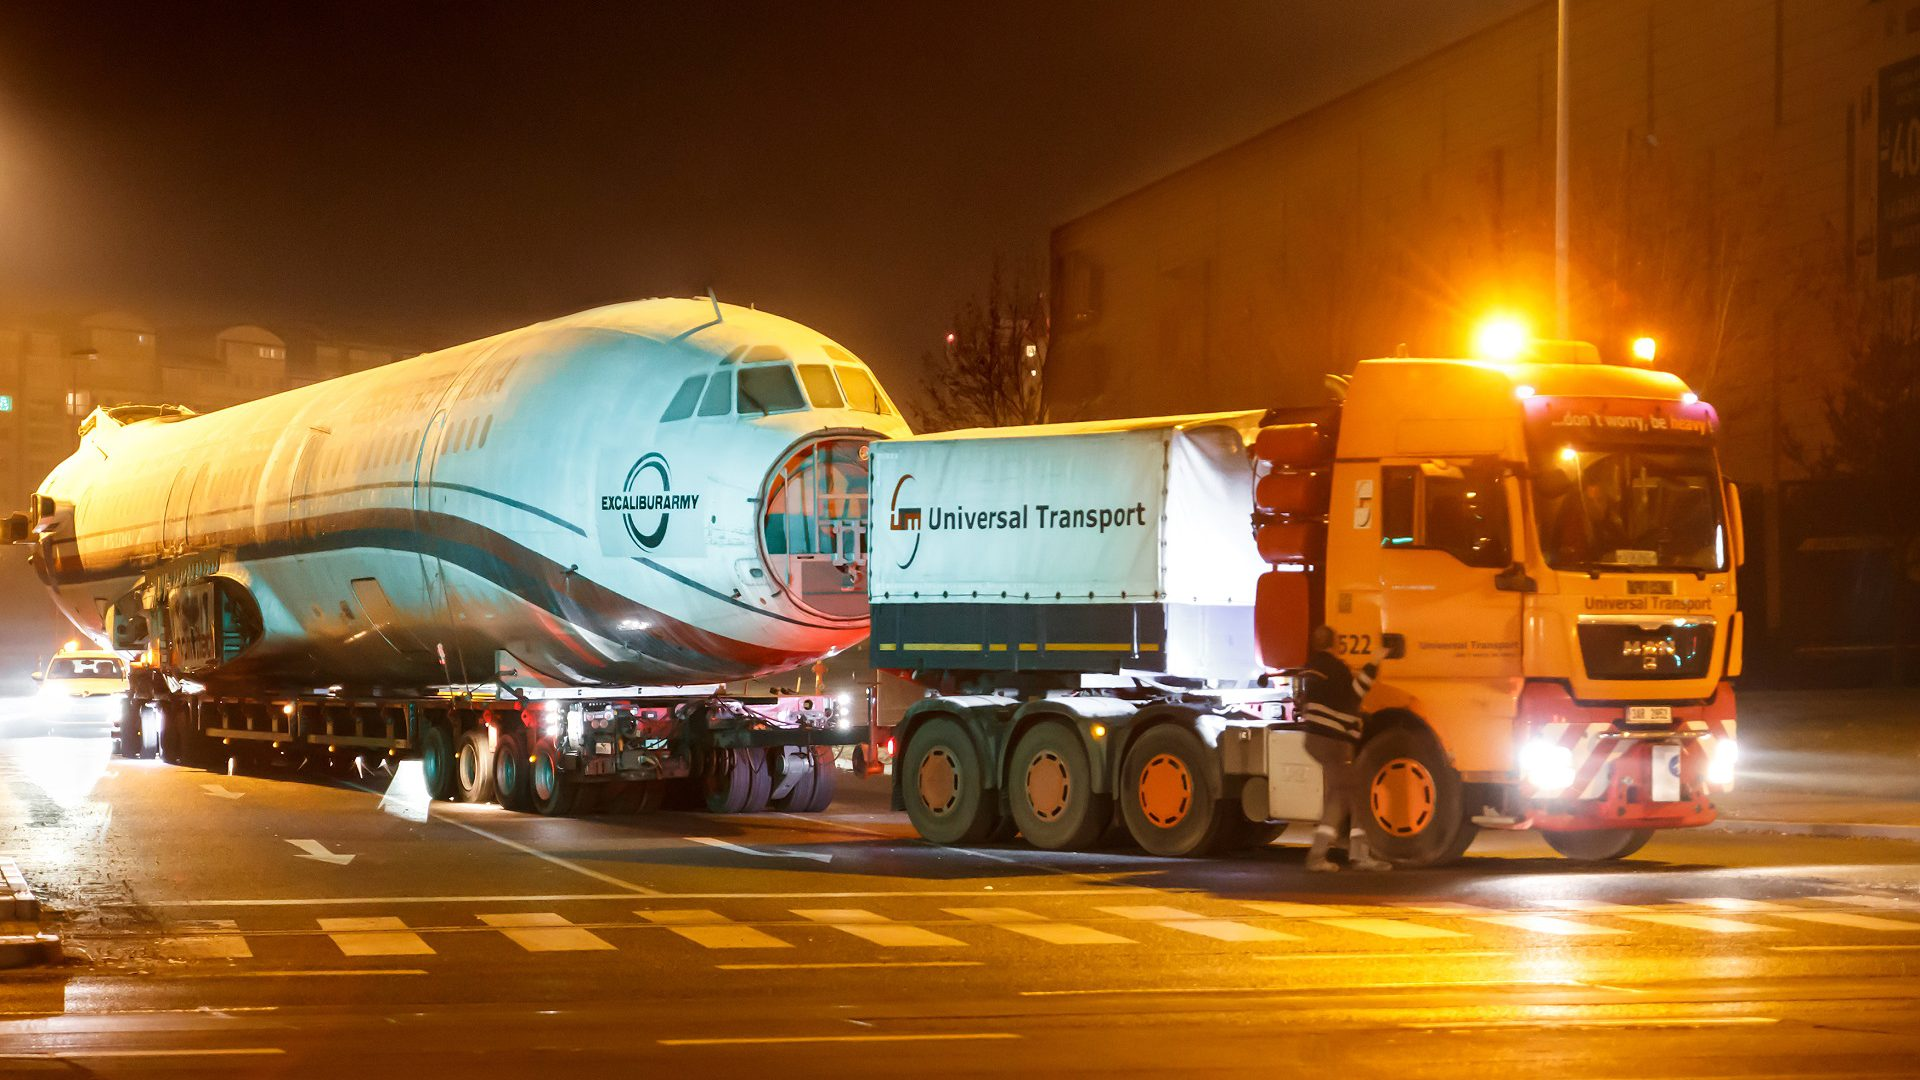 Transporte internacional de carga sobredimensionada